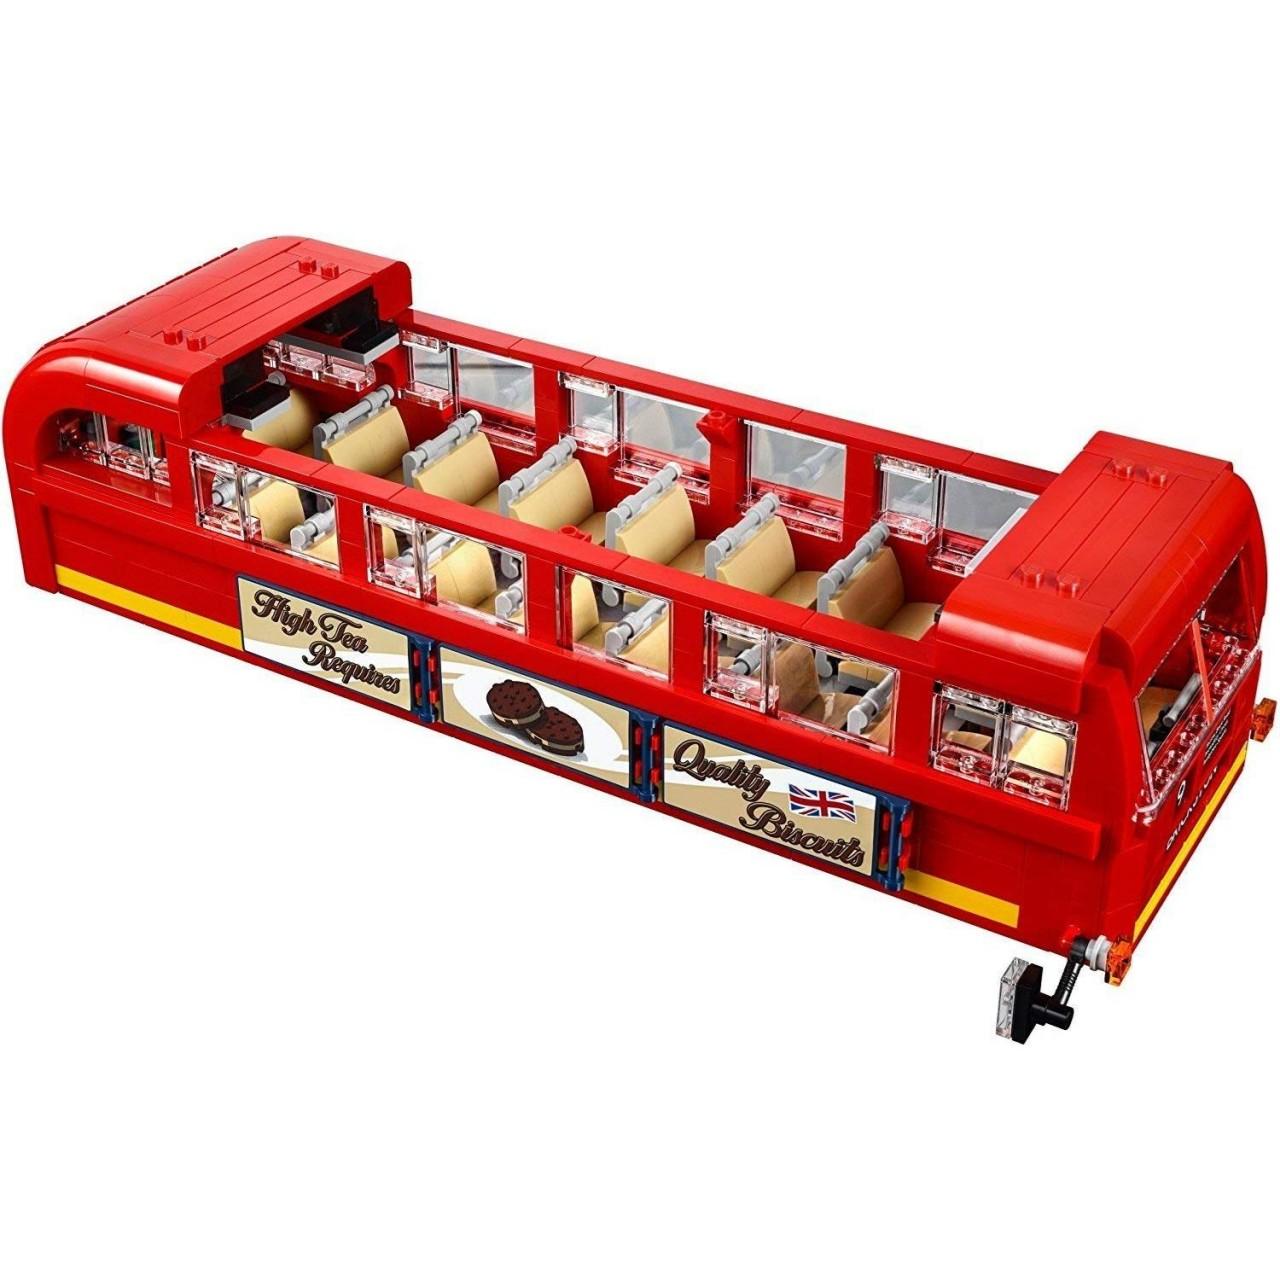 LEGO CREATOR 10258 Londoner Bus